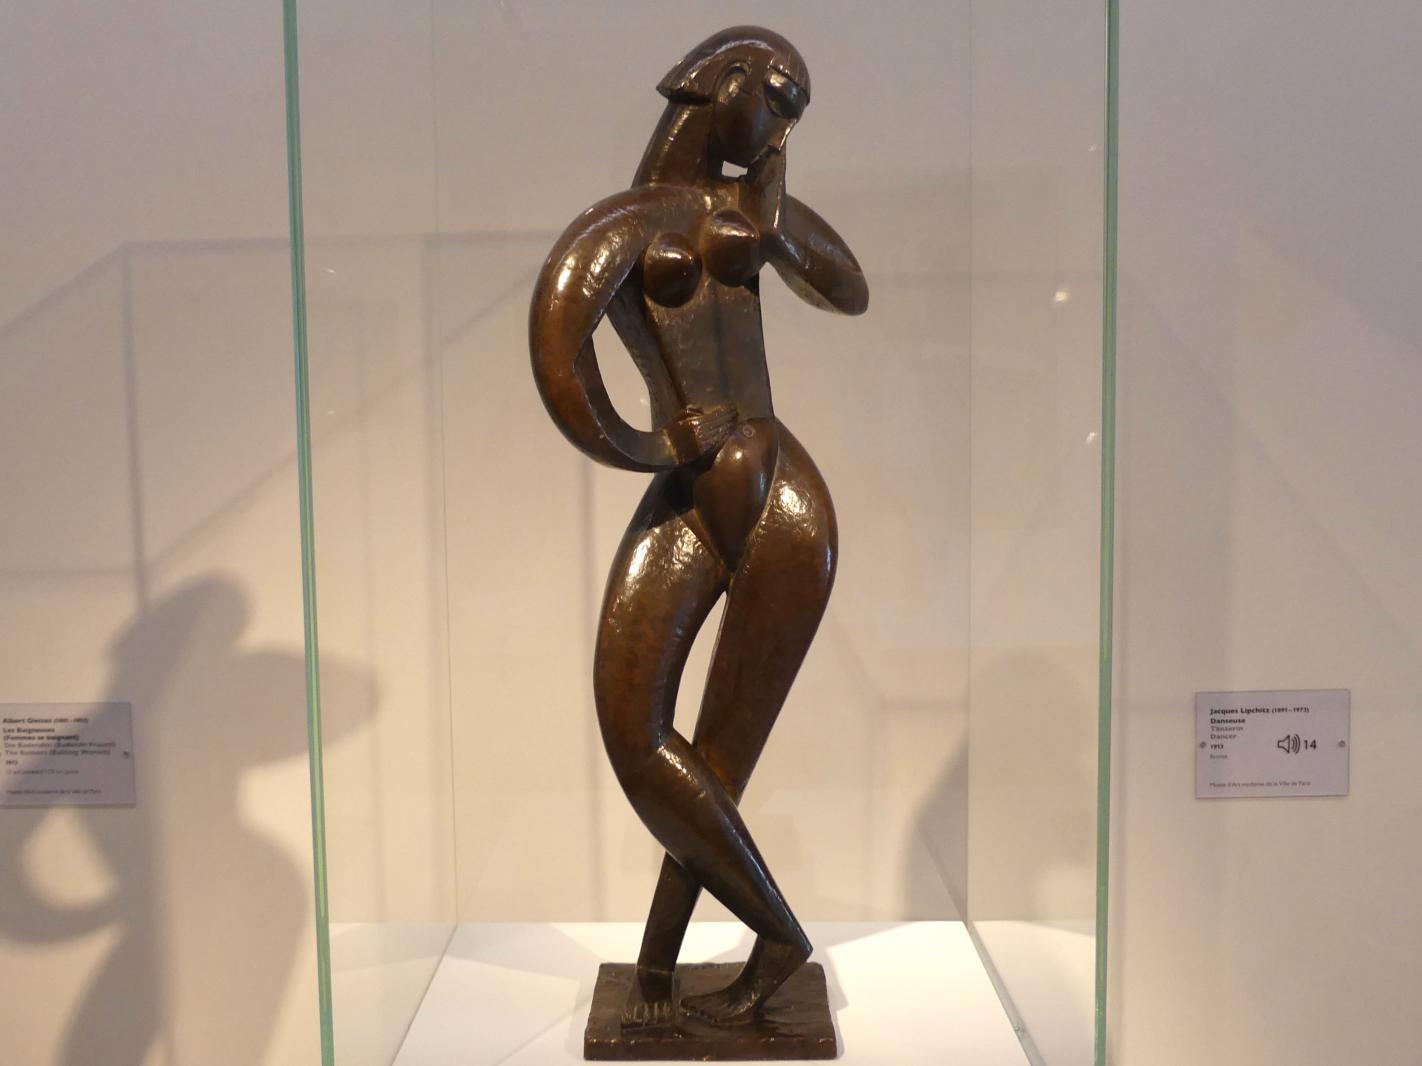 Jacques Lipchitz: Tänzerin, 1913